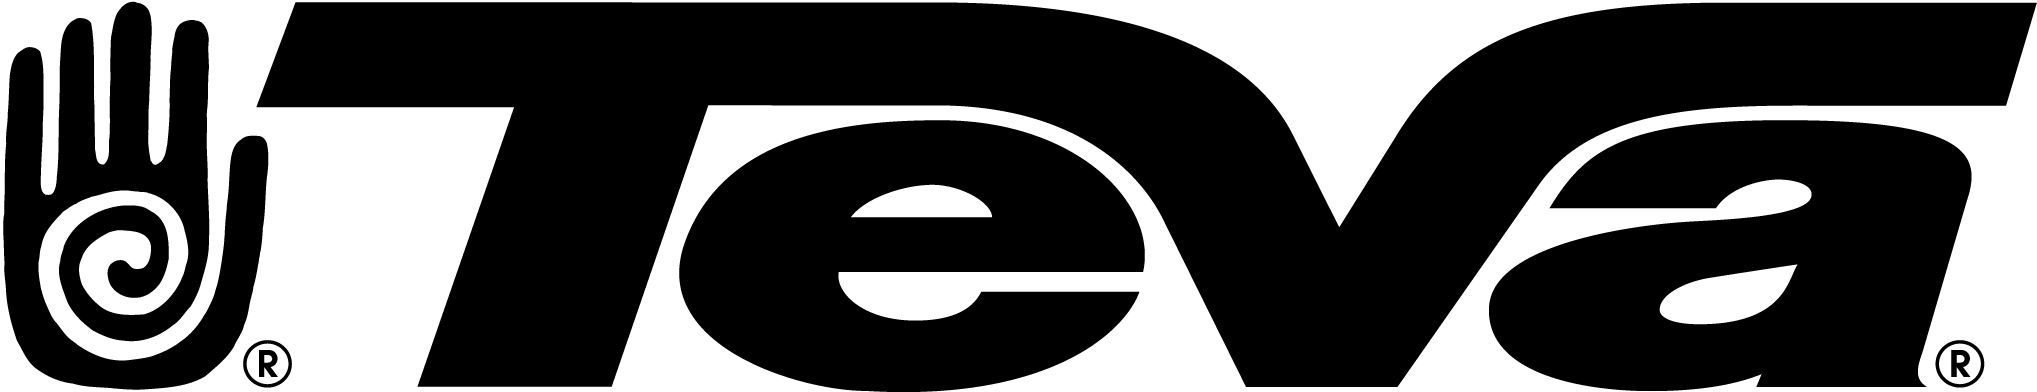 Teva logo clipart png freeuse library Teva Logo - LogoDix png freeuse library